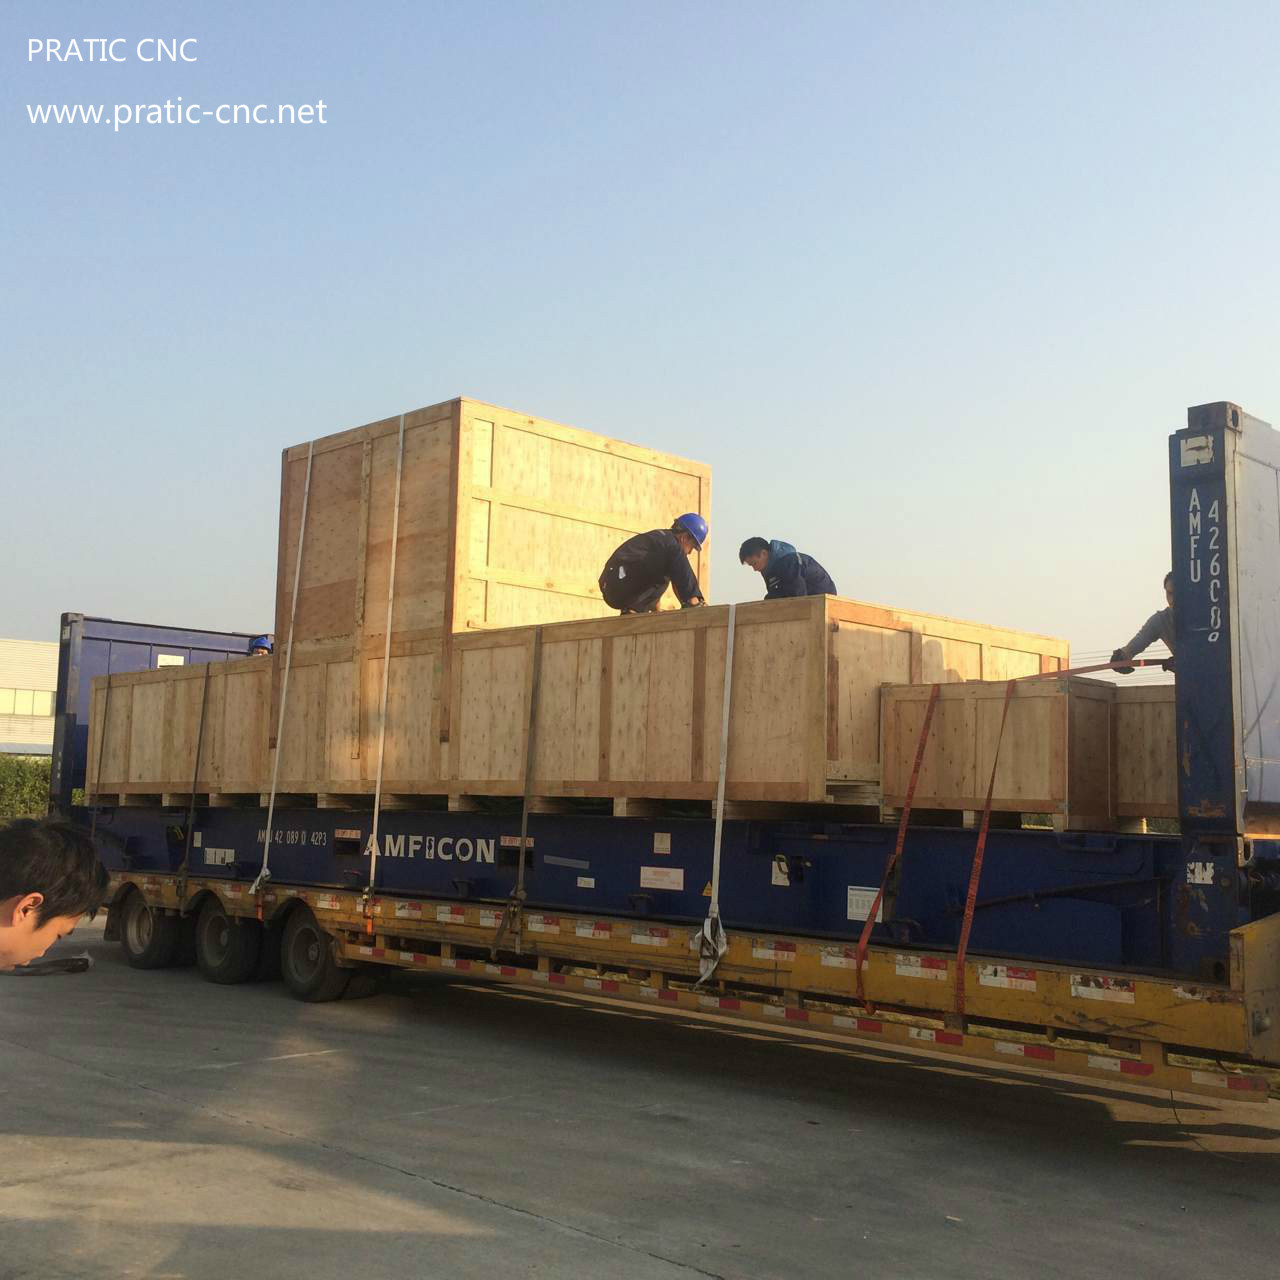 CNC Machining Parts Milling Machine with Pratic Pyb